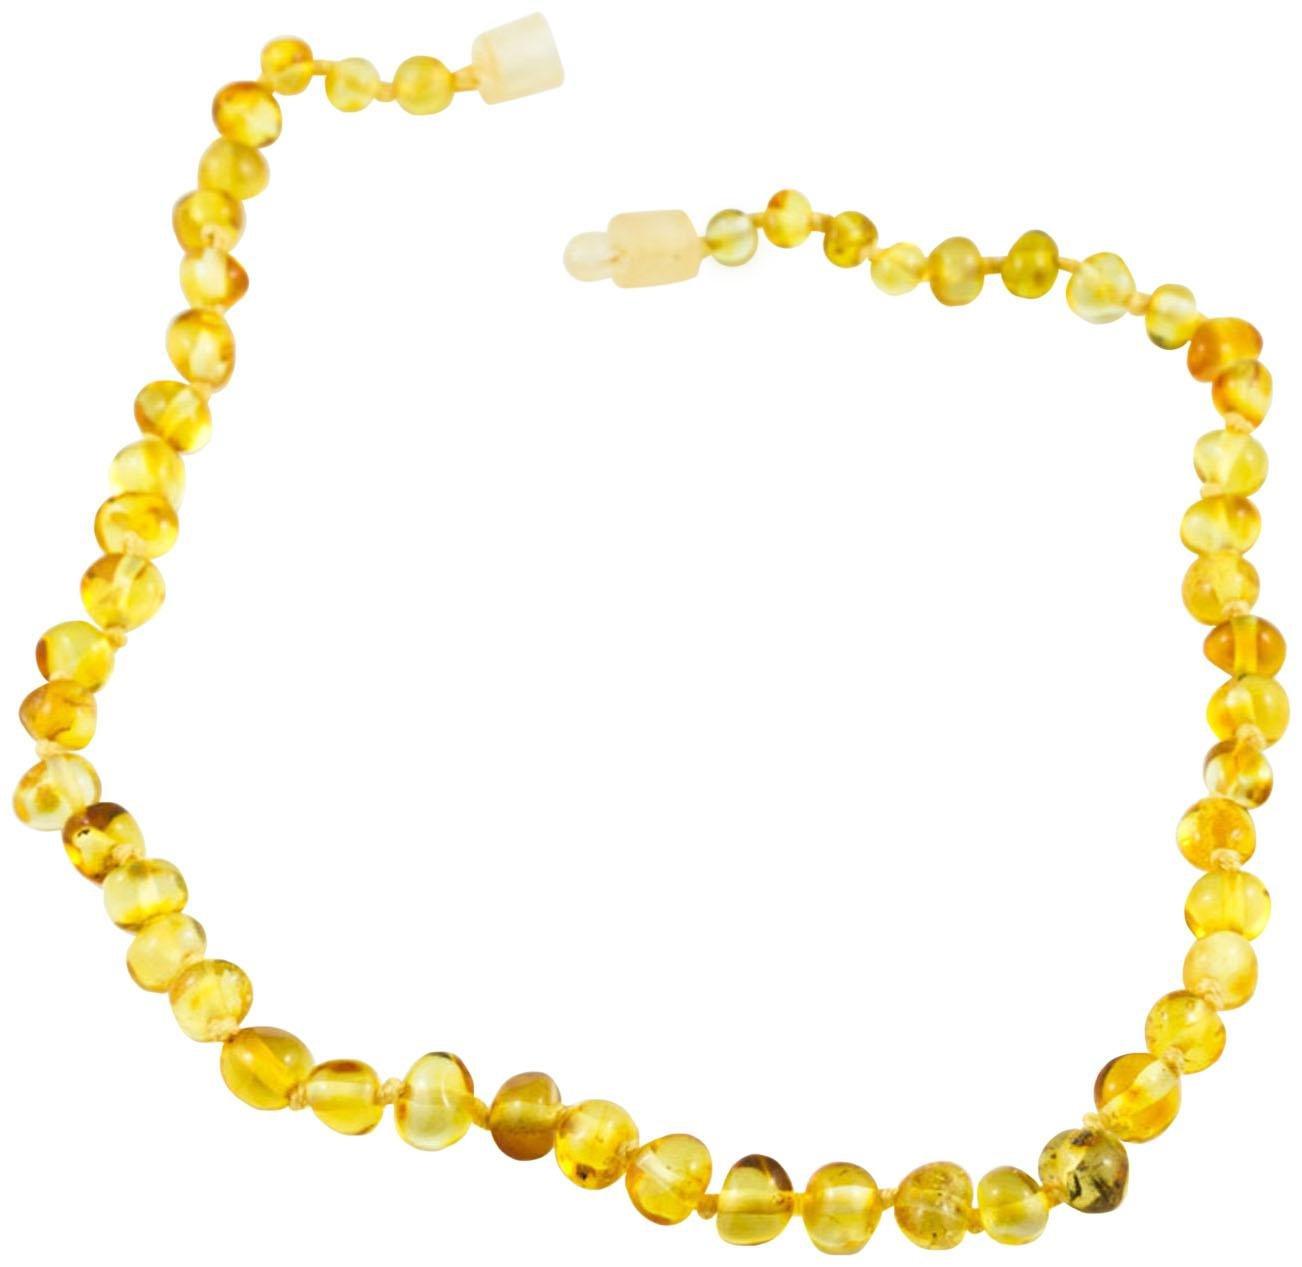 Healing Hazel 100% Baltic Amber Teething Necklace - Honey 11